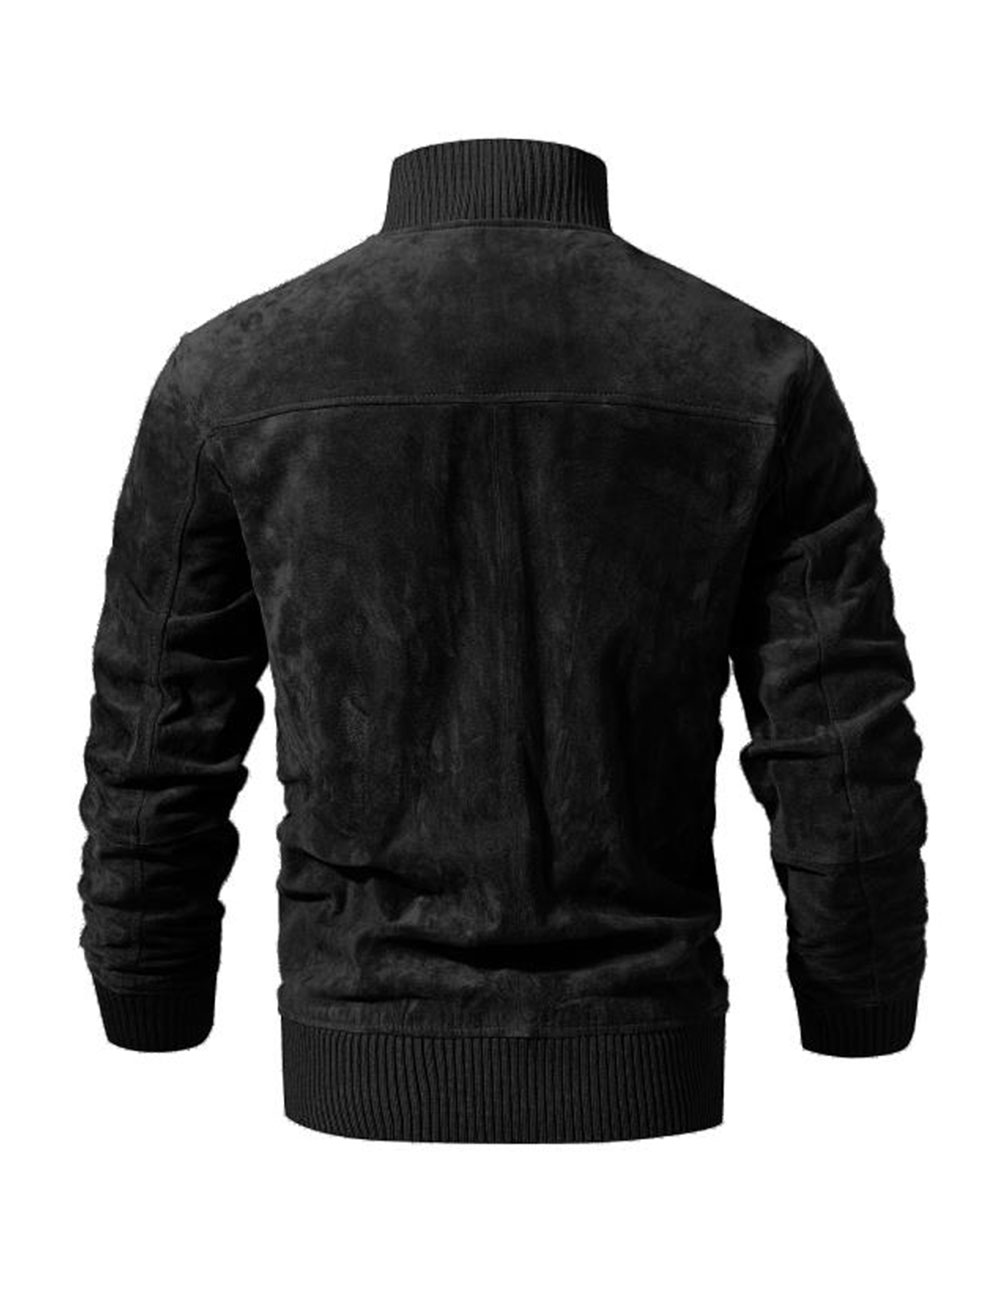 HTB12dDdlBjTBKNjSZFuq6z0HFXaT FLAVOR Men's Real Leather Jacket Men Pigskin Slim Fit Genuine Leather Coat With Rib Cuff Standing Collar